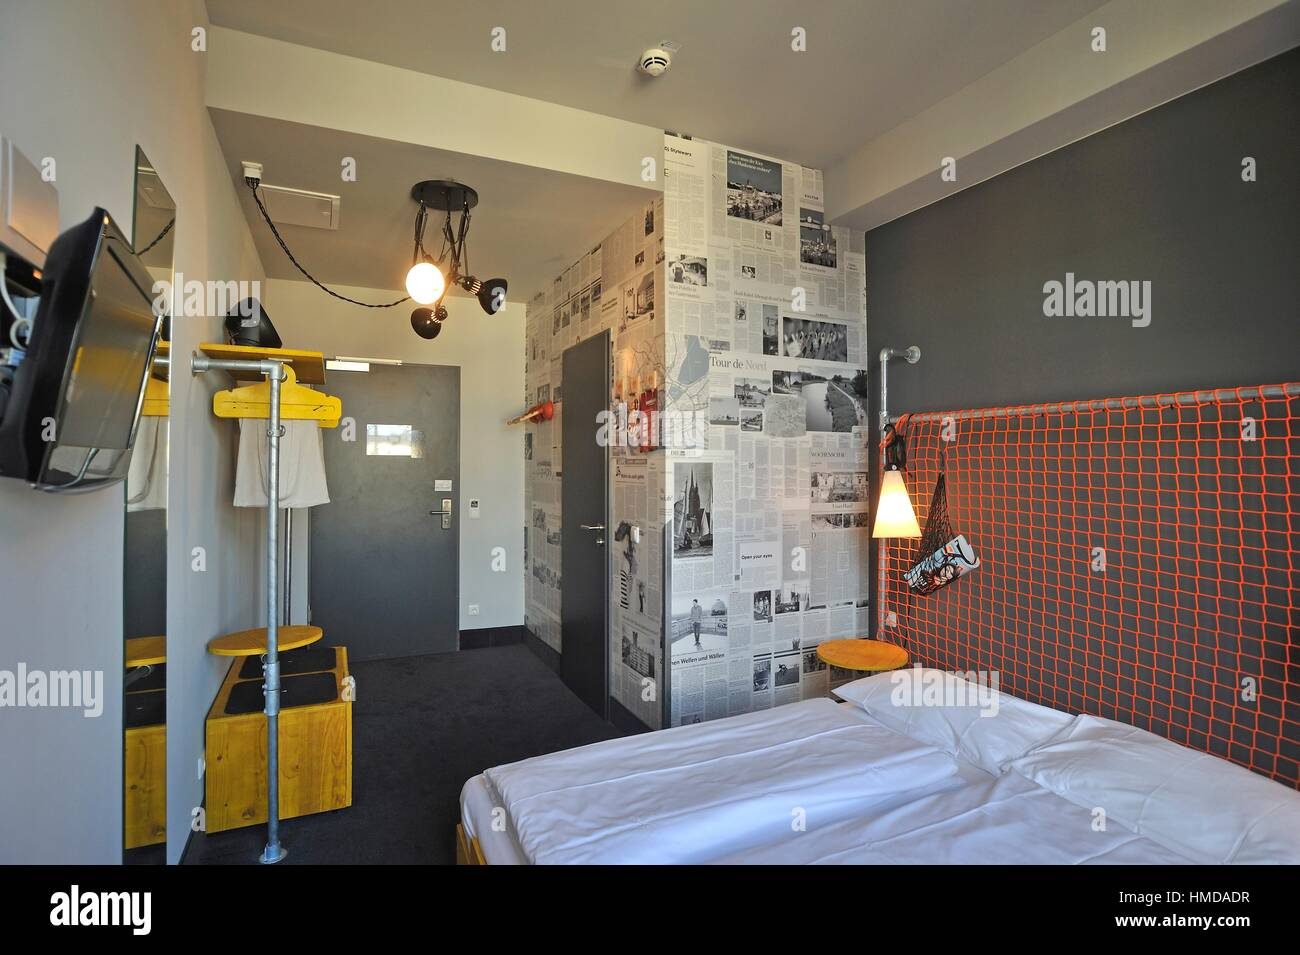 schanze stockfotos schanze bilder alamy. Black Bedroom Furniture Sets. Home Design Ideas